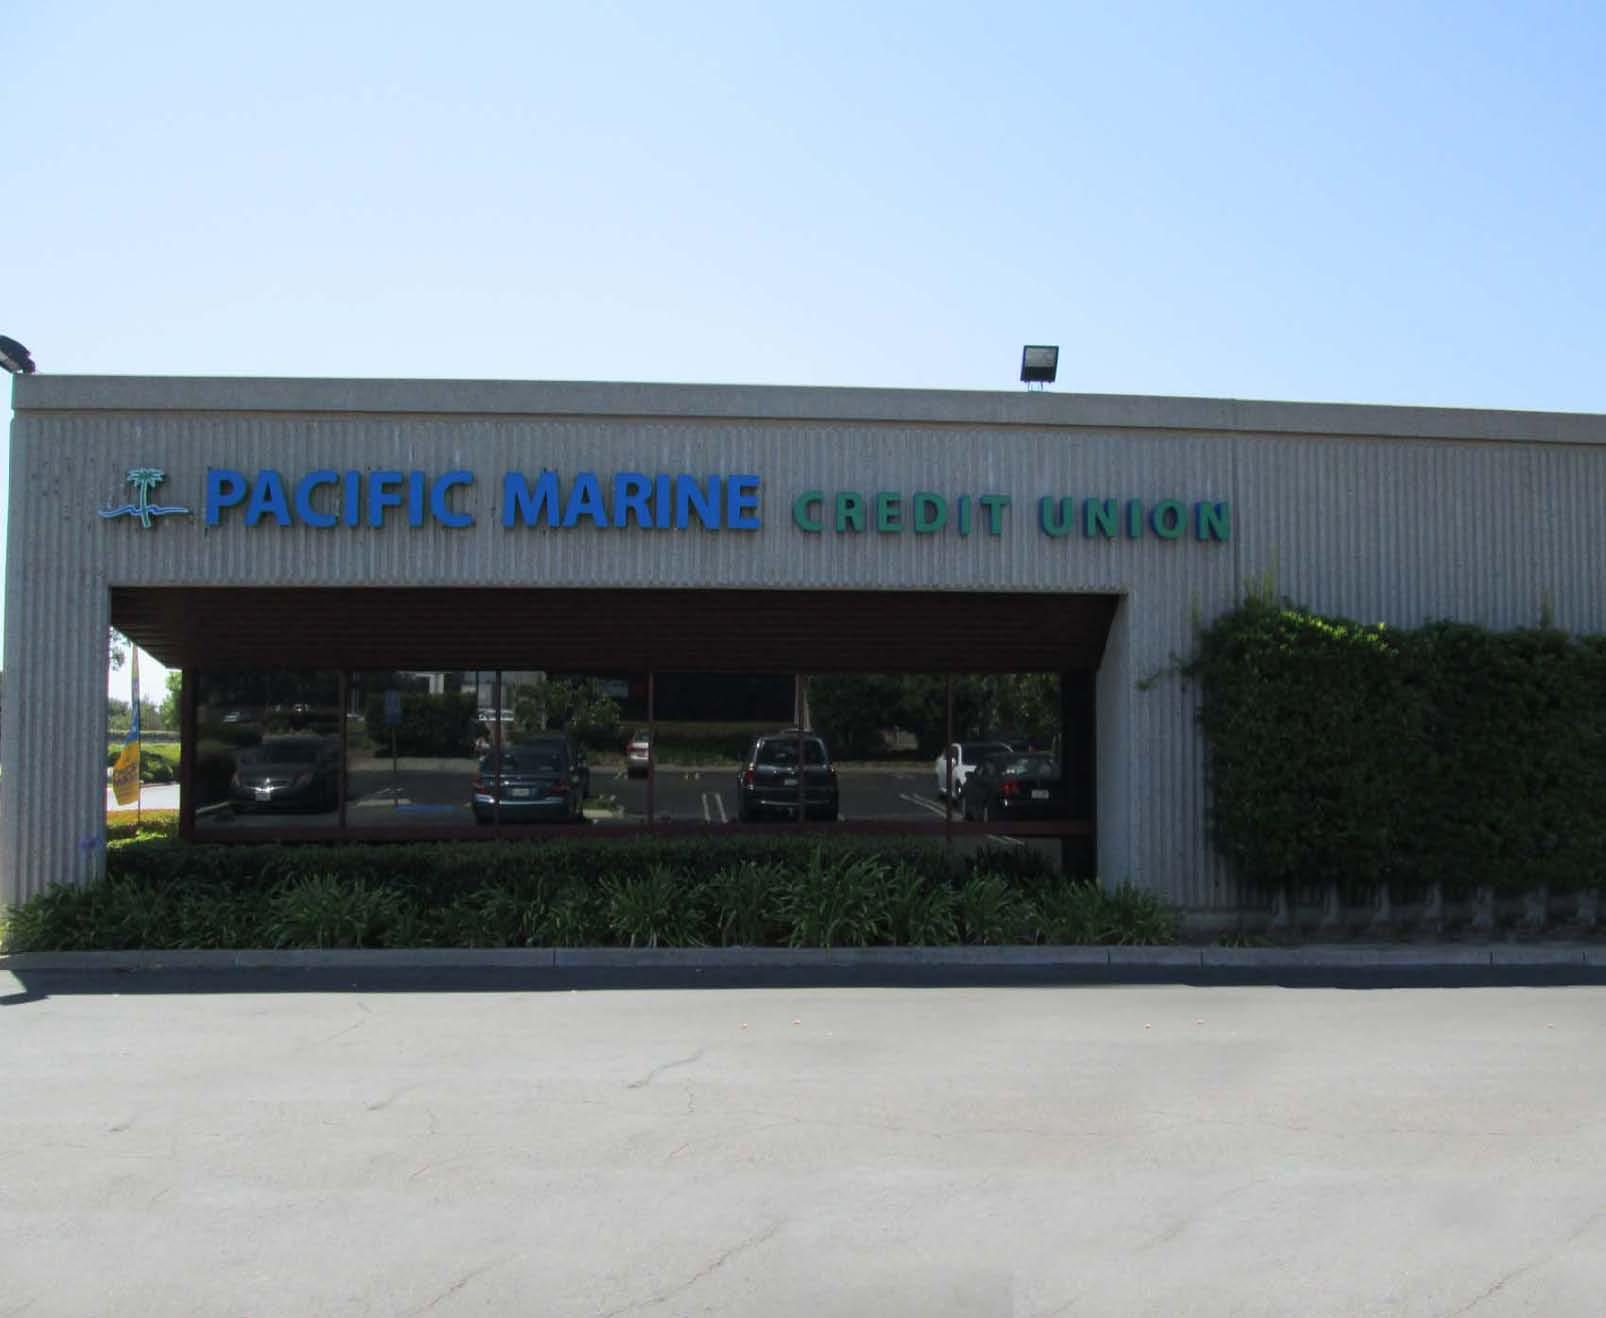 Pacific Marine Credit Union - ad image